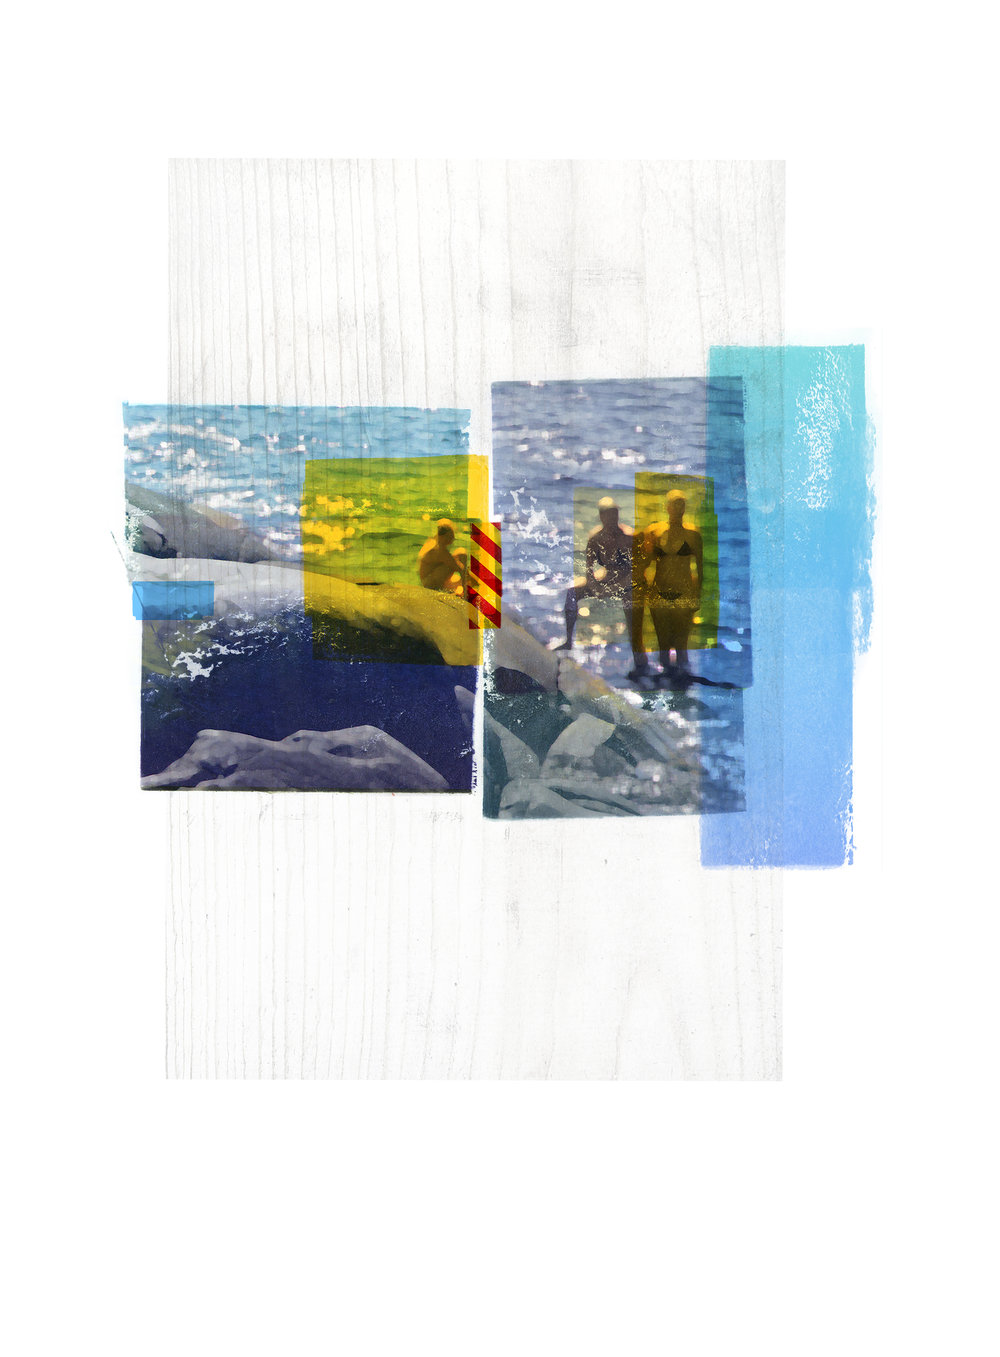 Zenit / (Meholmen)  Original pigment print / BFK rives 250 gr 25 x 35 cm /13,7 x 10 in Edition of 50 + 7 Ap Editeur: Per Fronth Studios / Henrik Aunevik  12/2014: